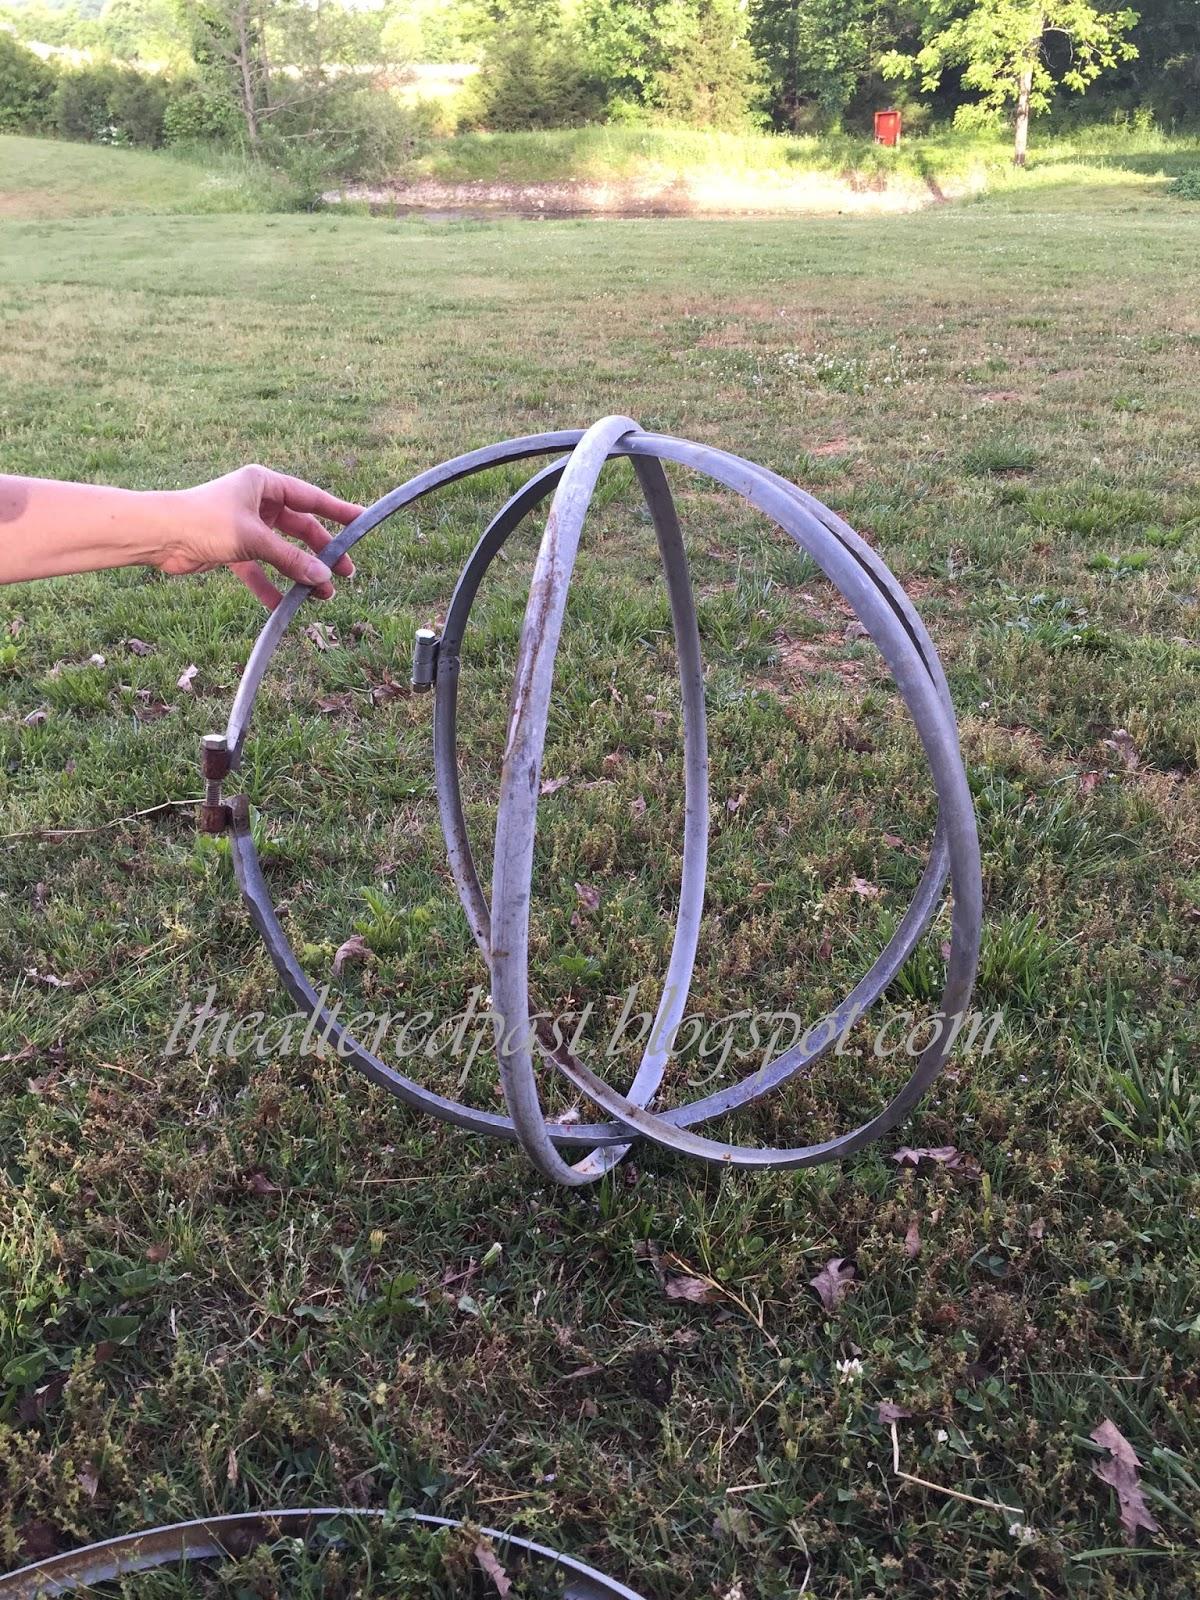 Spain Hill Farm Repurpose Steel Drum Rings into Garden Orbs